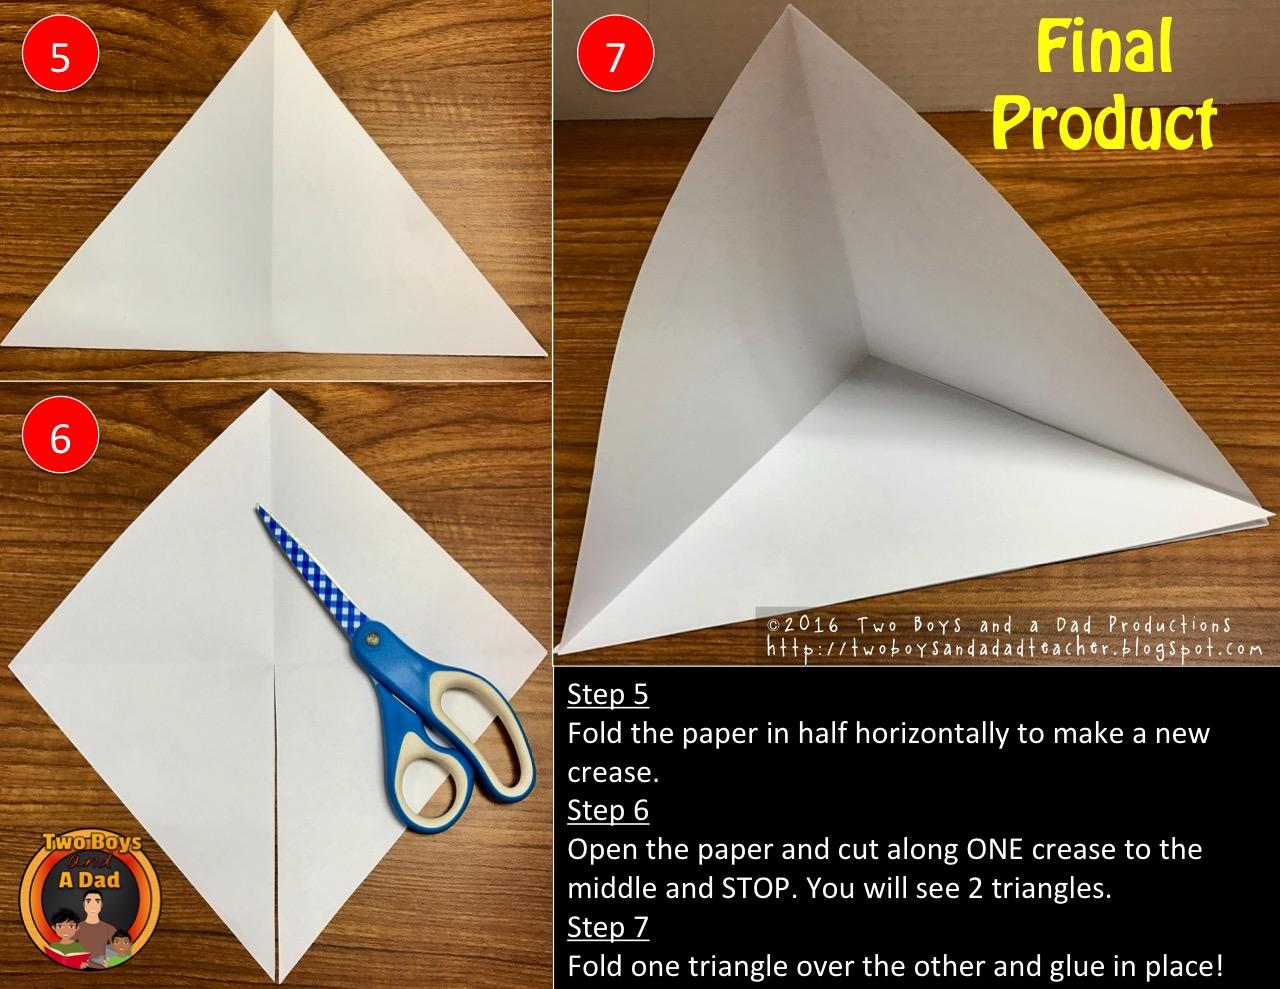 steps for tri-rama